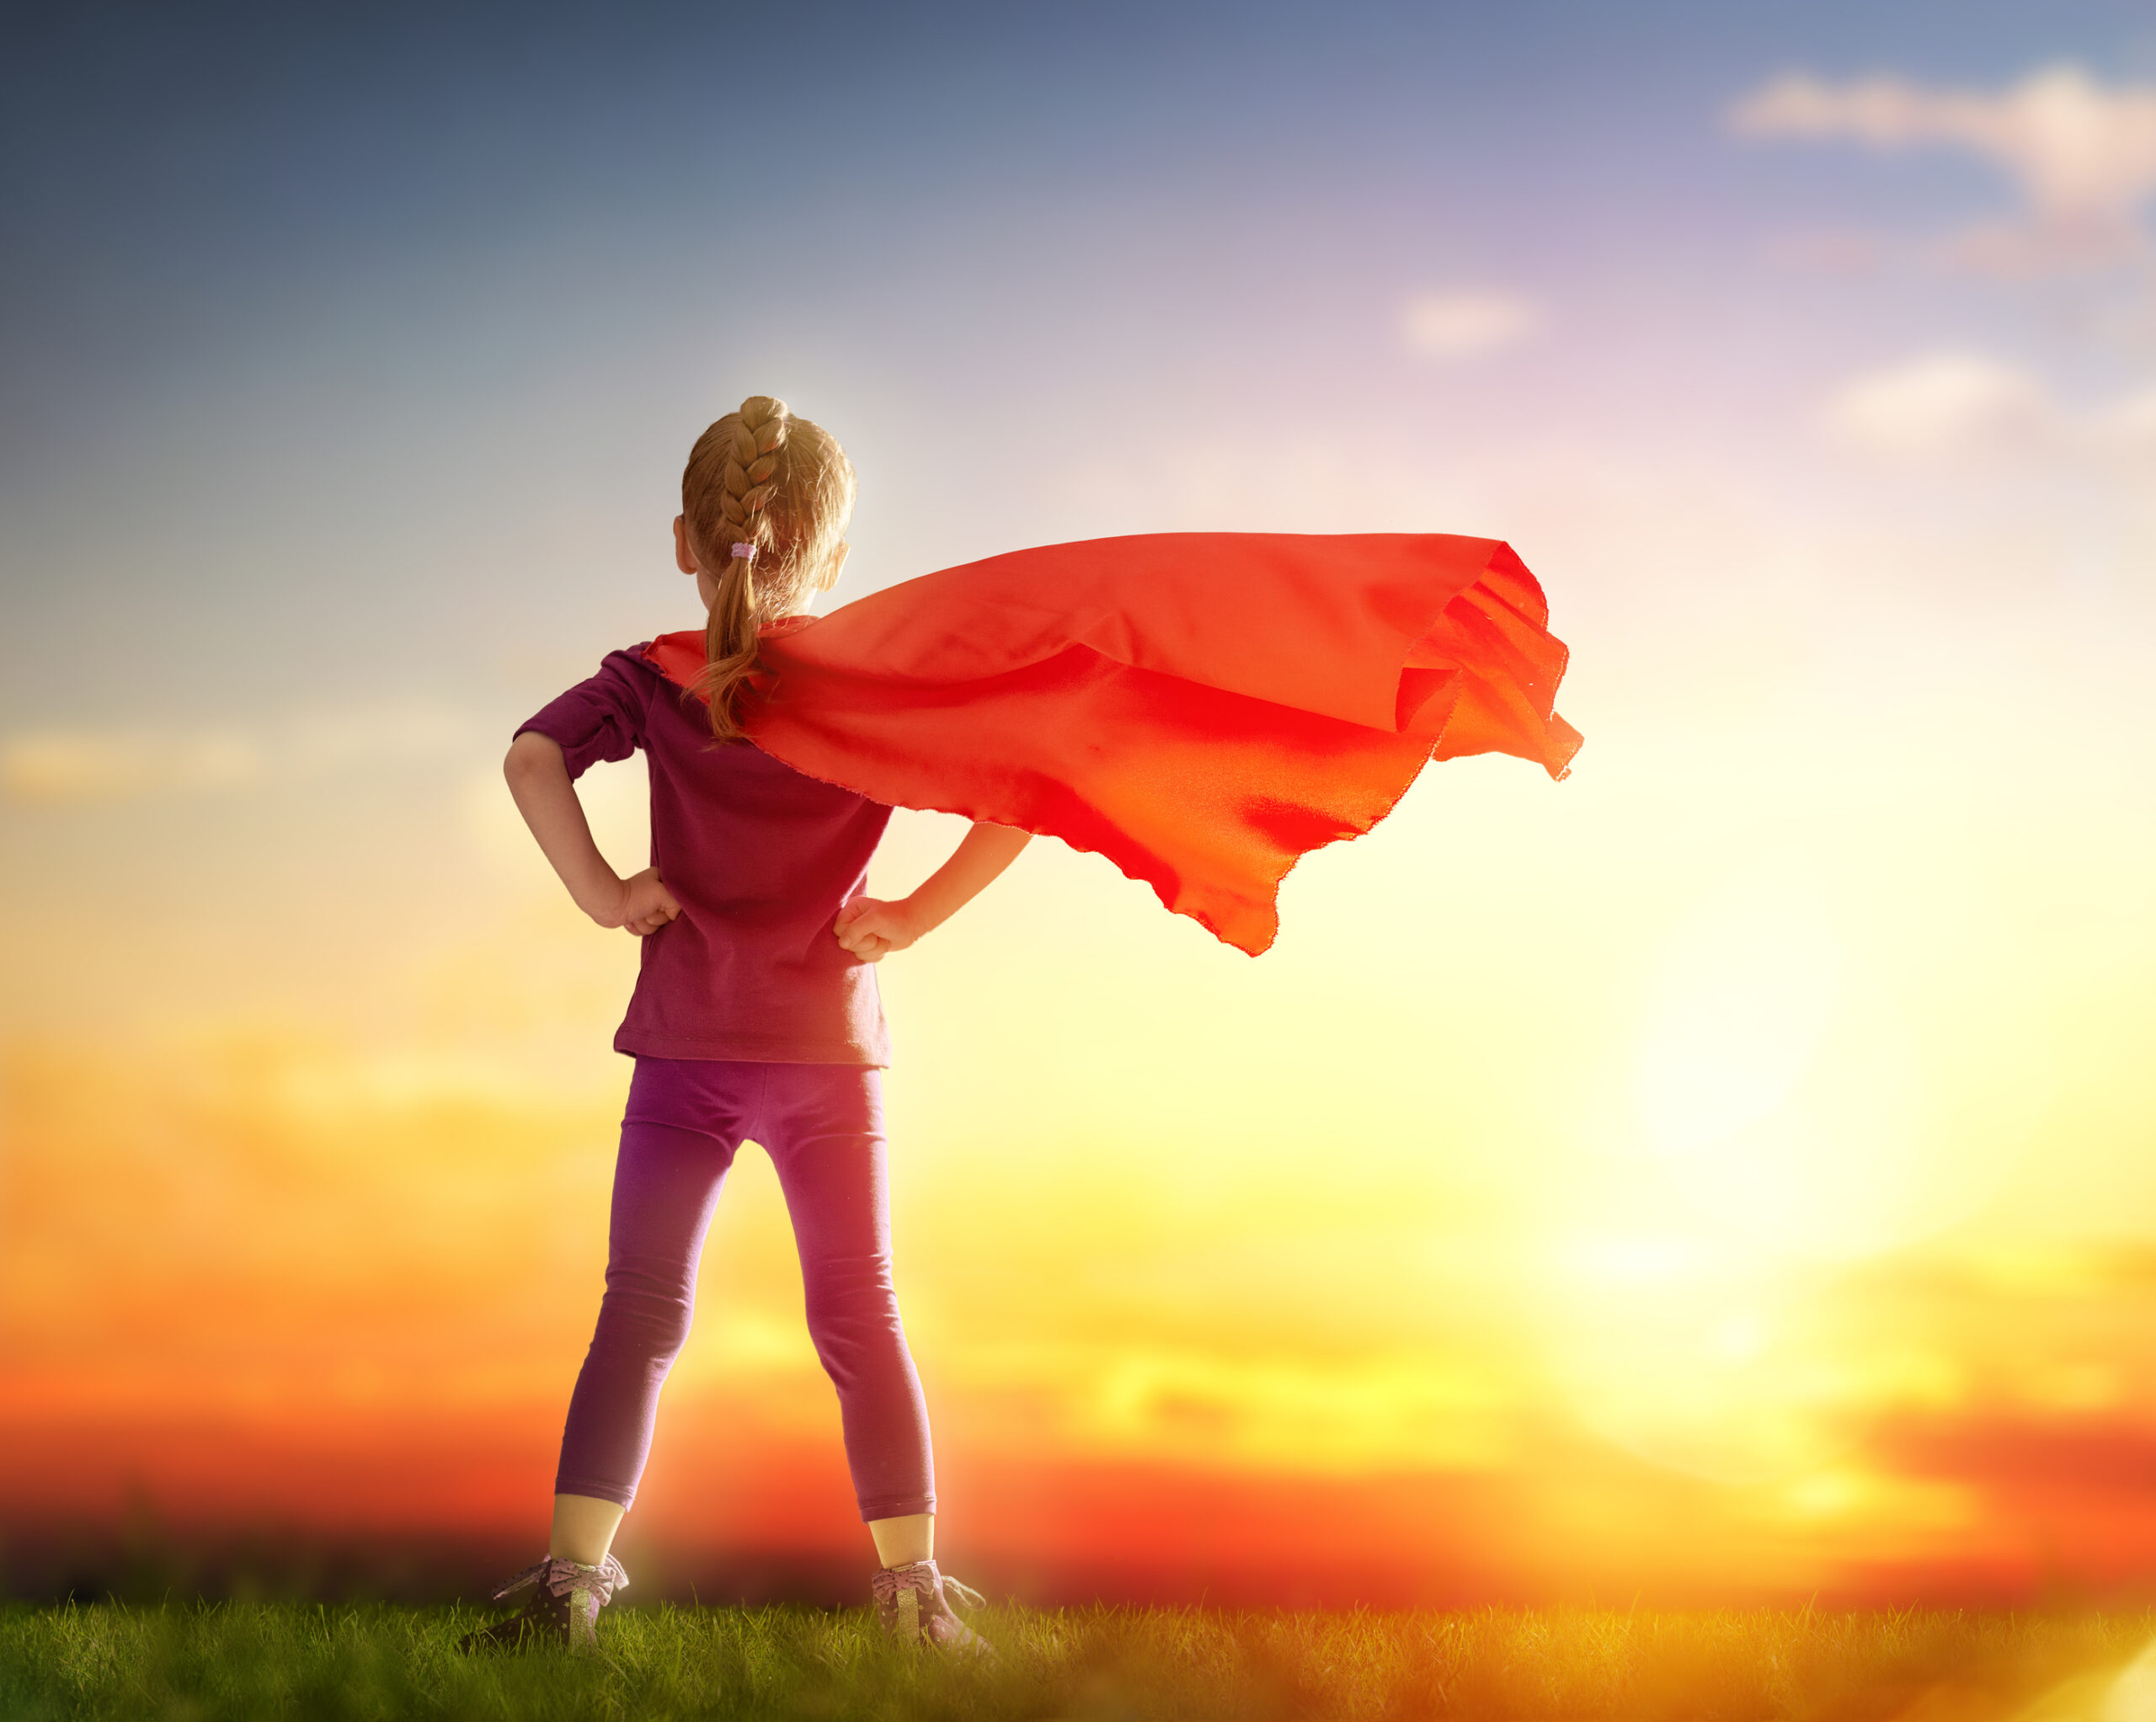 Little child girl plays superhero. Child standing before sunset